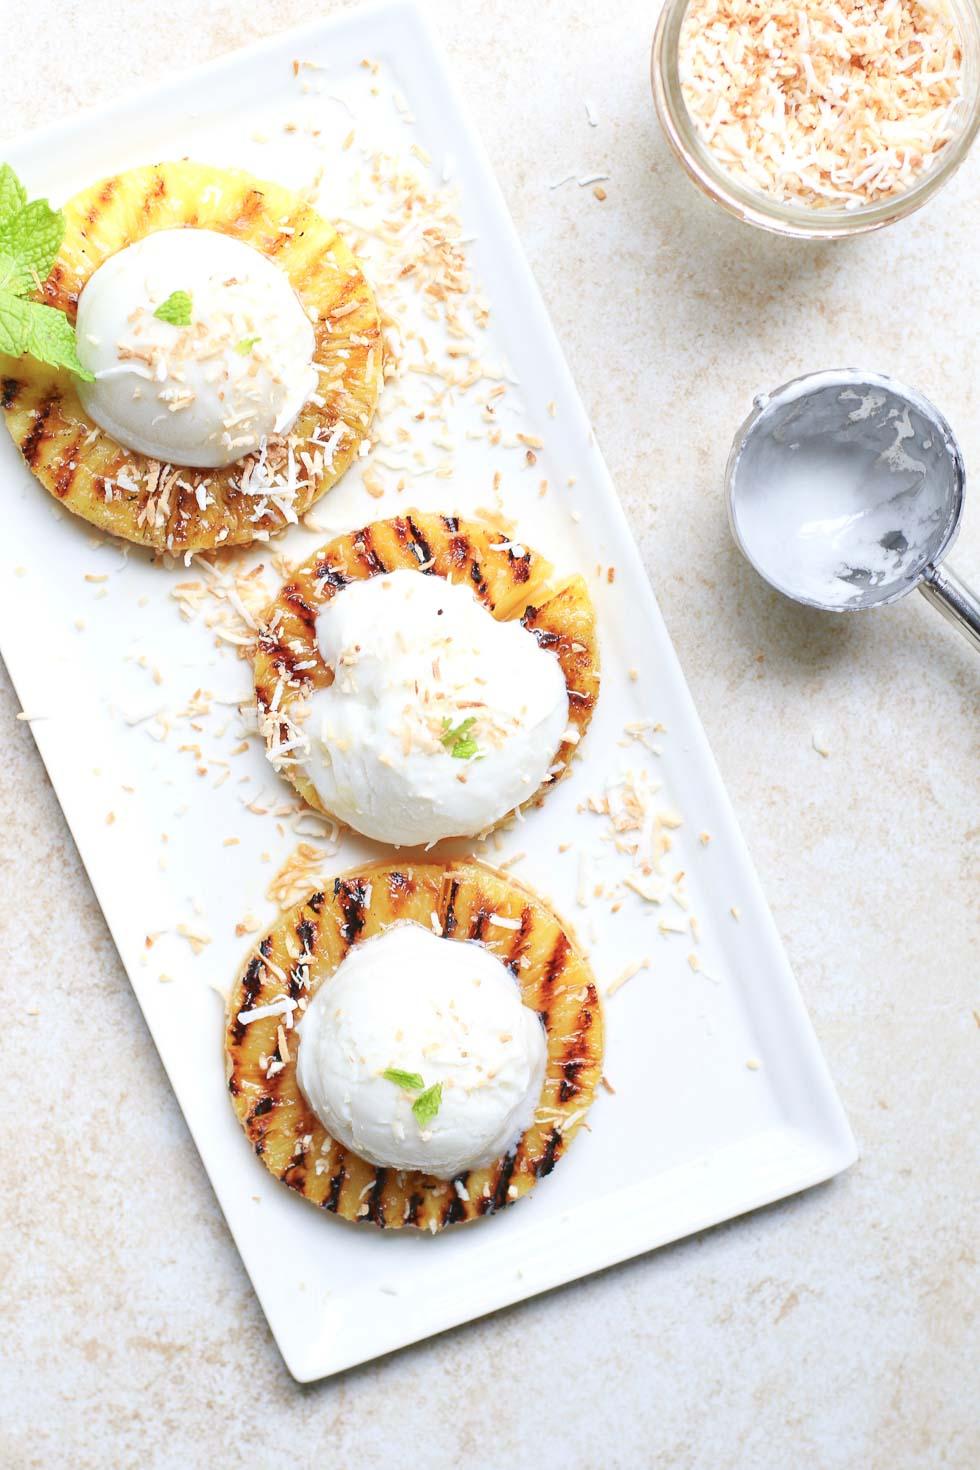 Piña Colada Grilled Pineapple Dessert